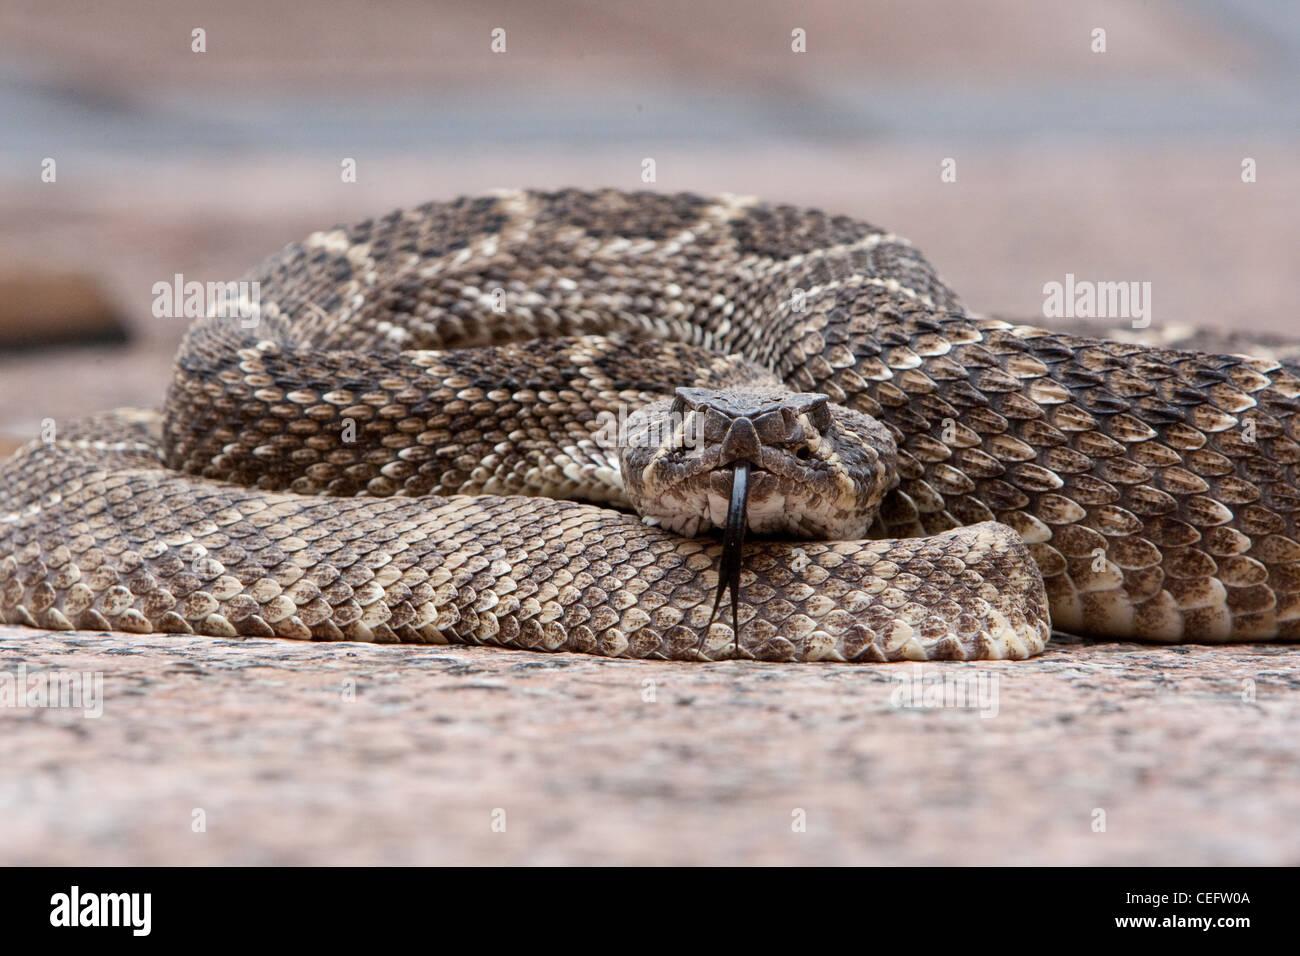 rattlesnake poisonous dangerous rattle venomous Crotalus Sistrurus predator - Stock Image